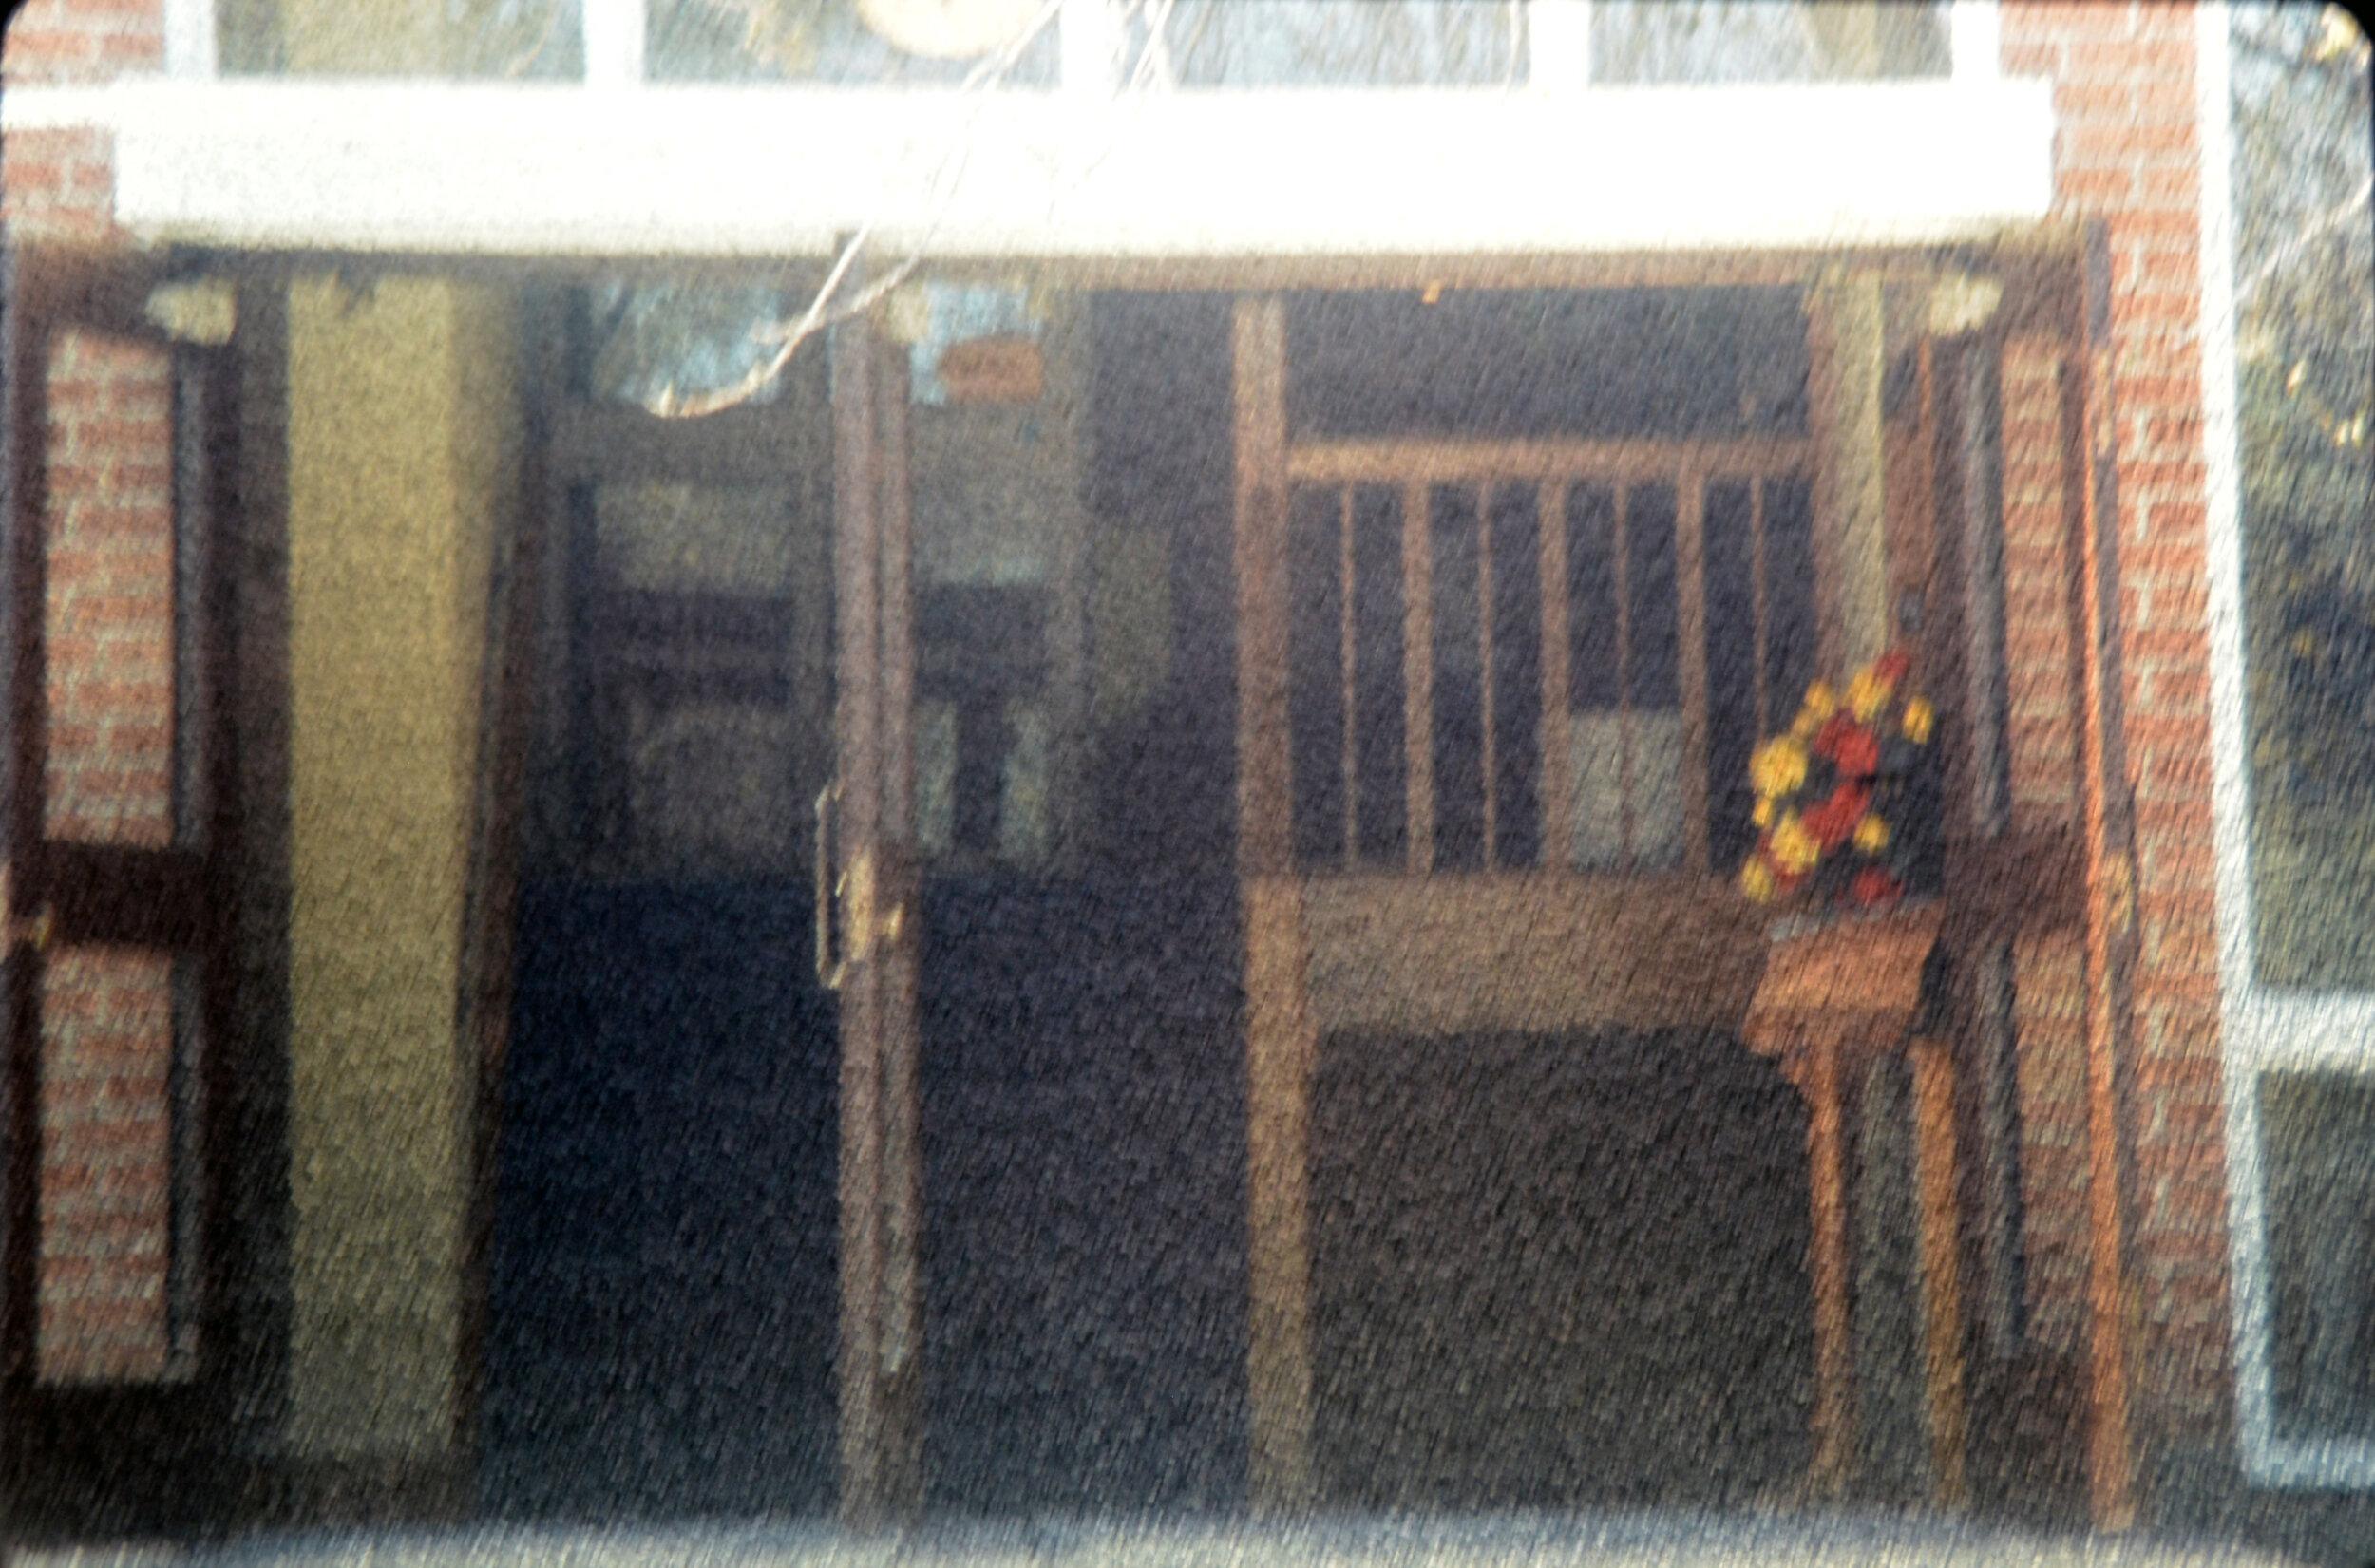 Historical SGC SGBC enterence 1972open.jpg